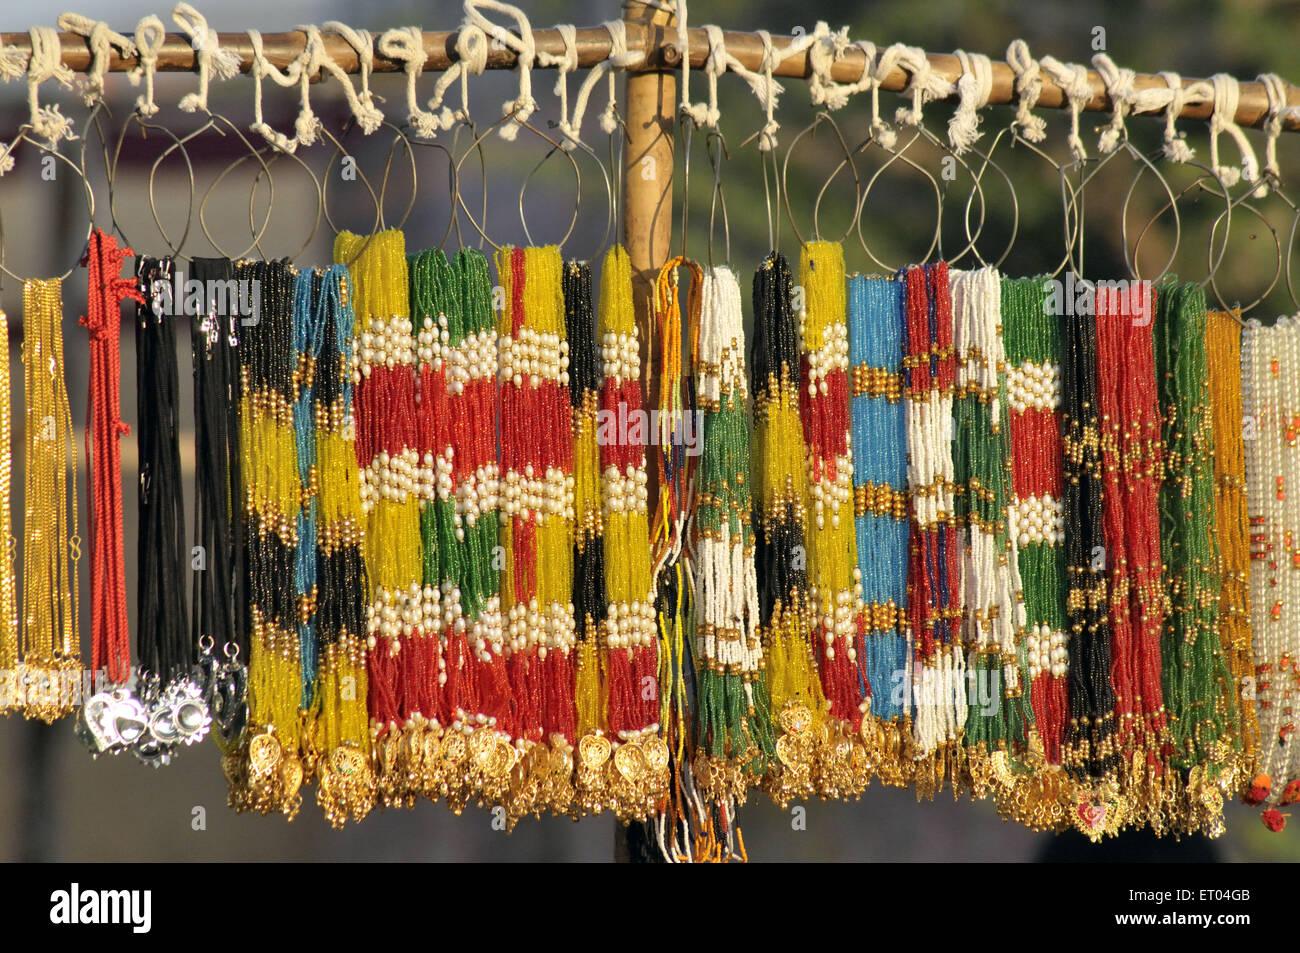 Billige Imitation Schmuck im Stall in Pushkar Rajasthan Indien Stockbild